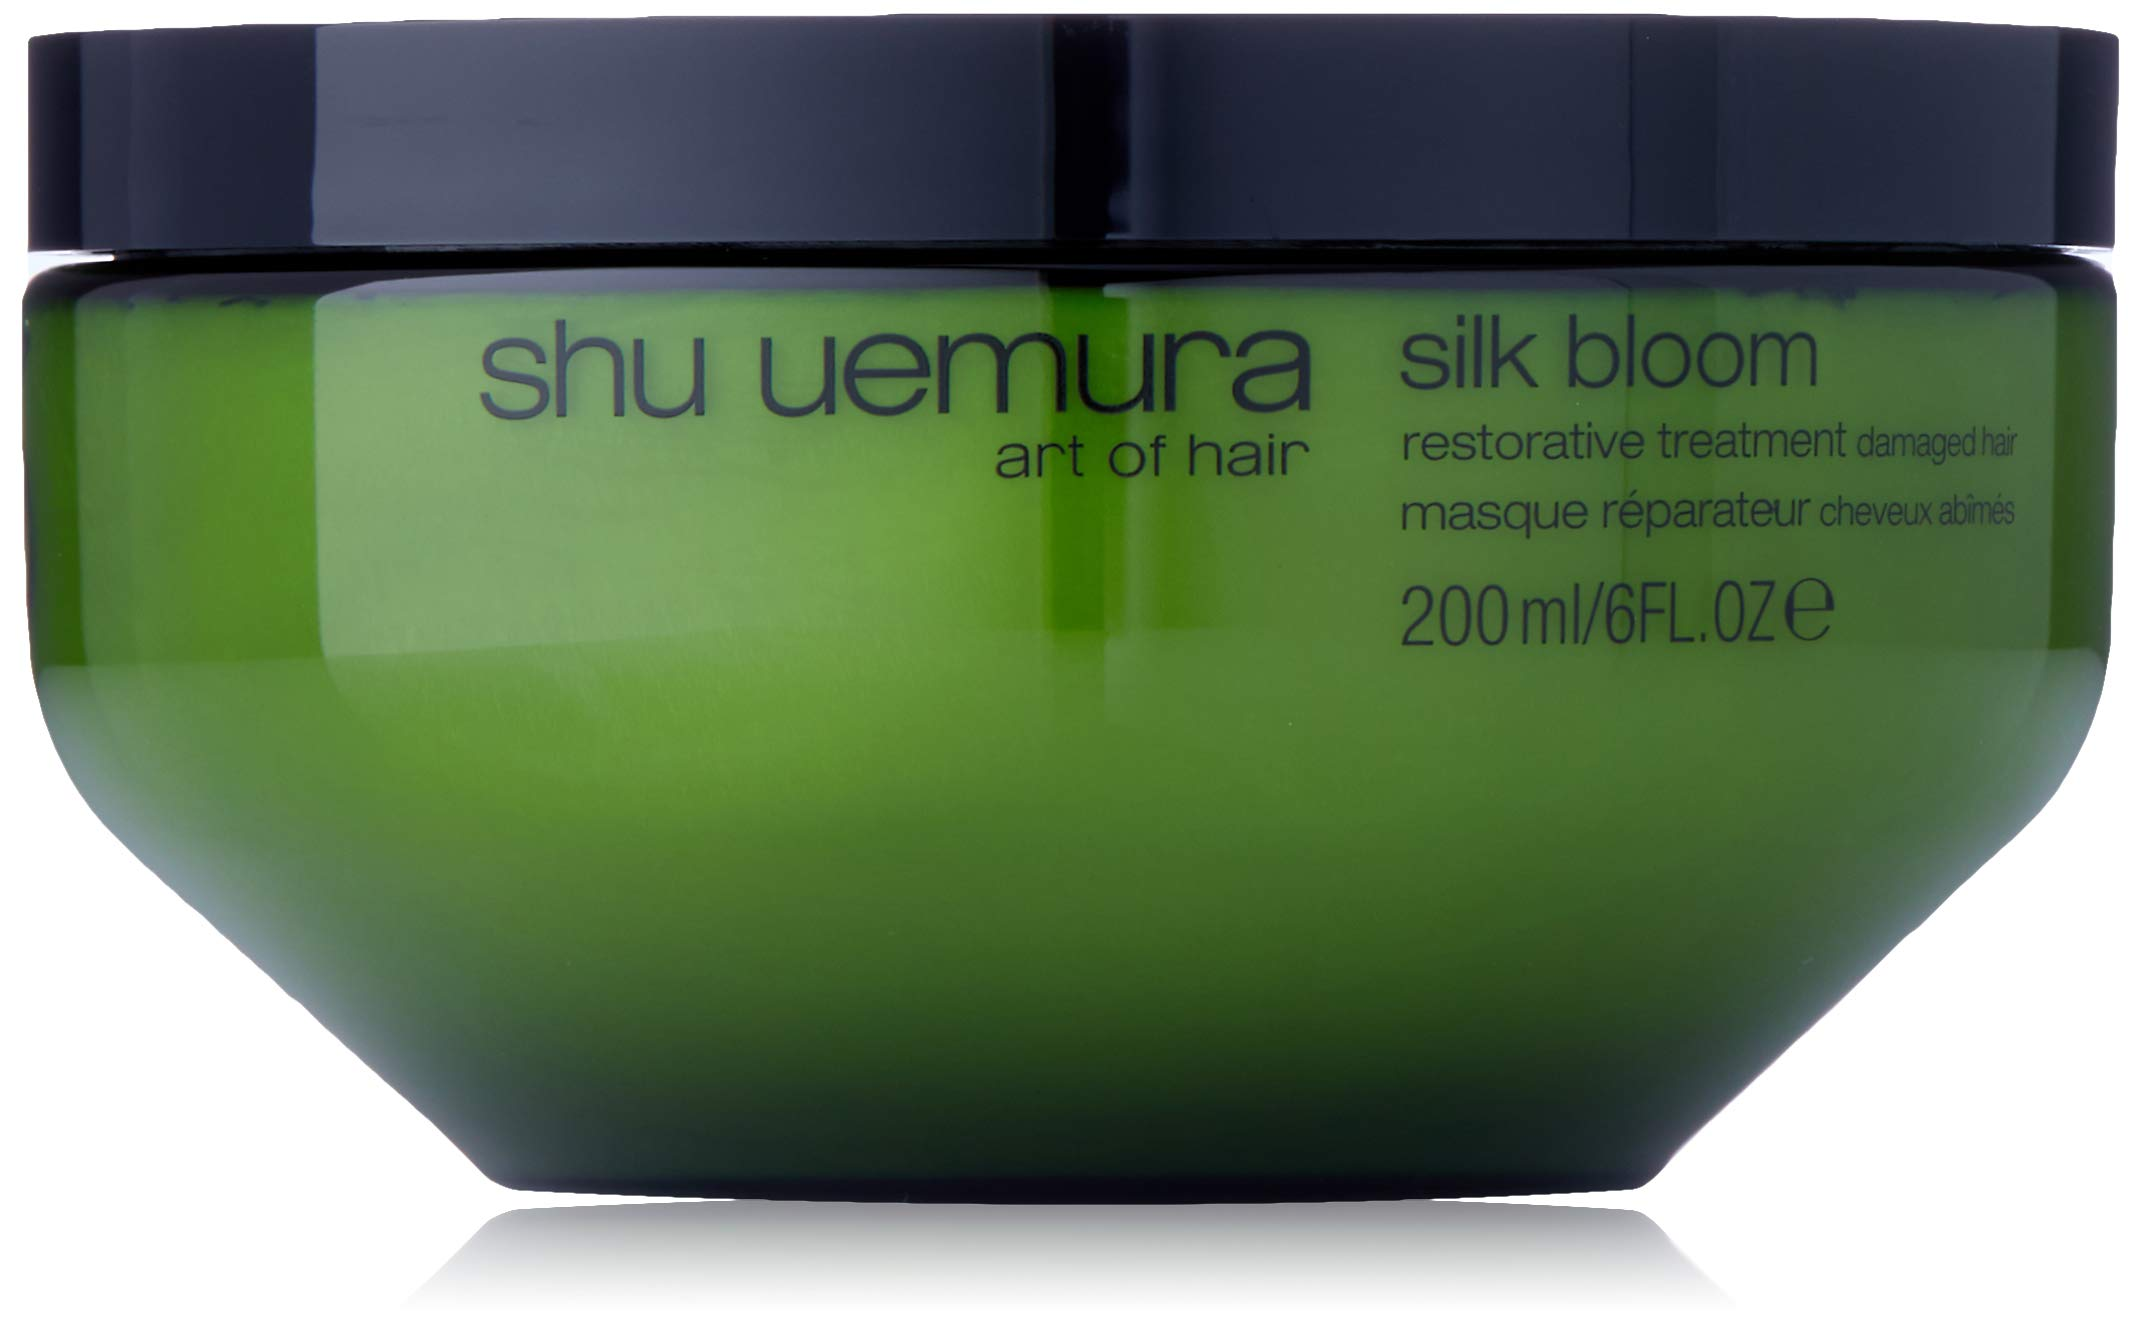 Shu Uemura Art of Hair Silk Bloom Treatment 200ml